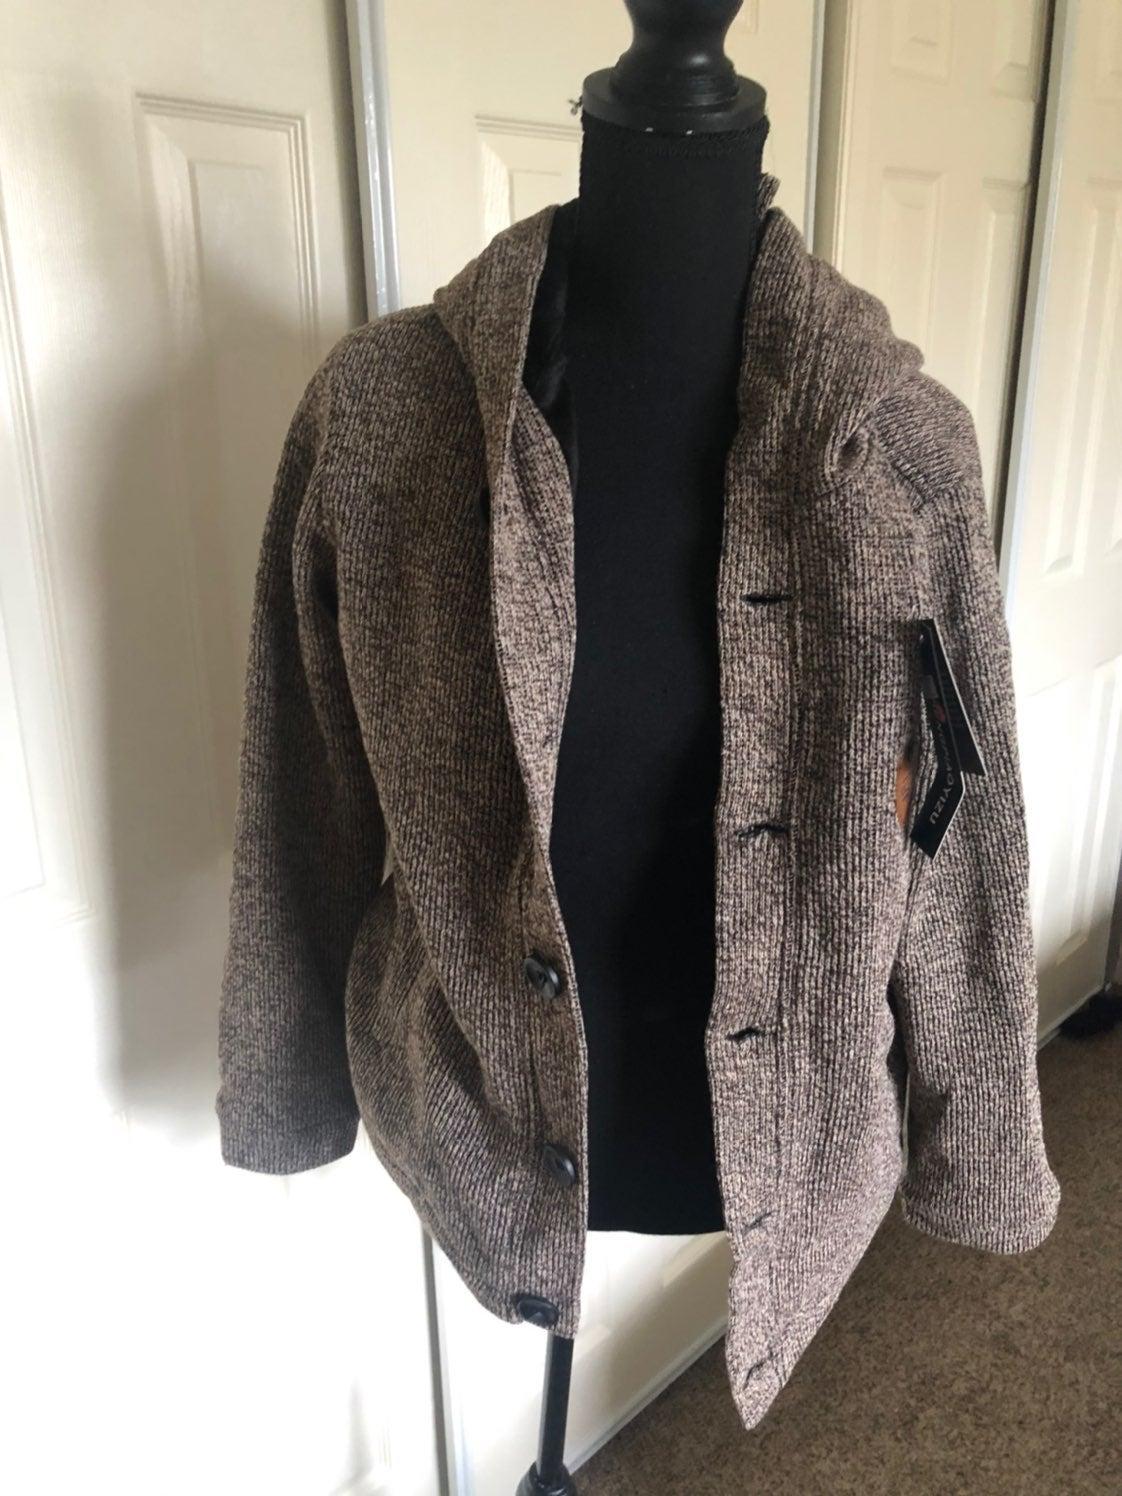 Warm loose men's sweater/jacket!